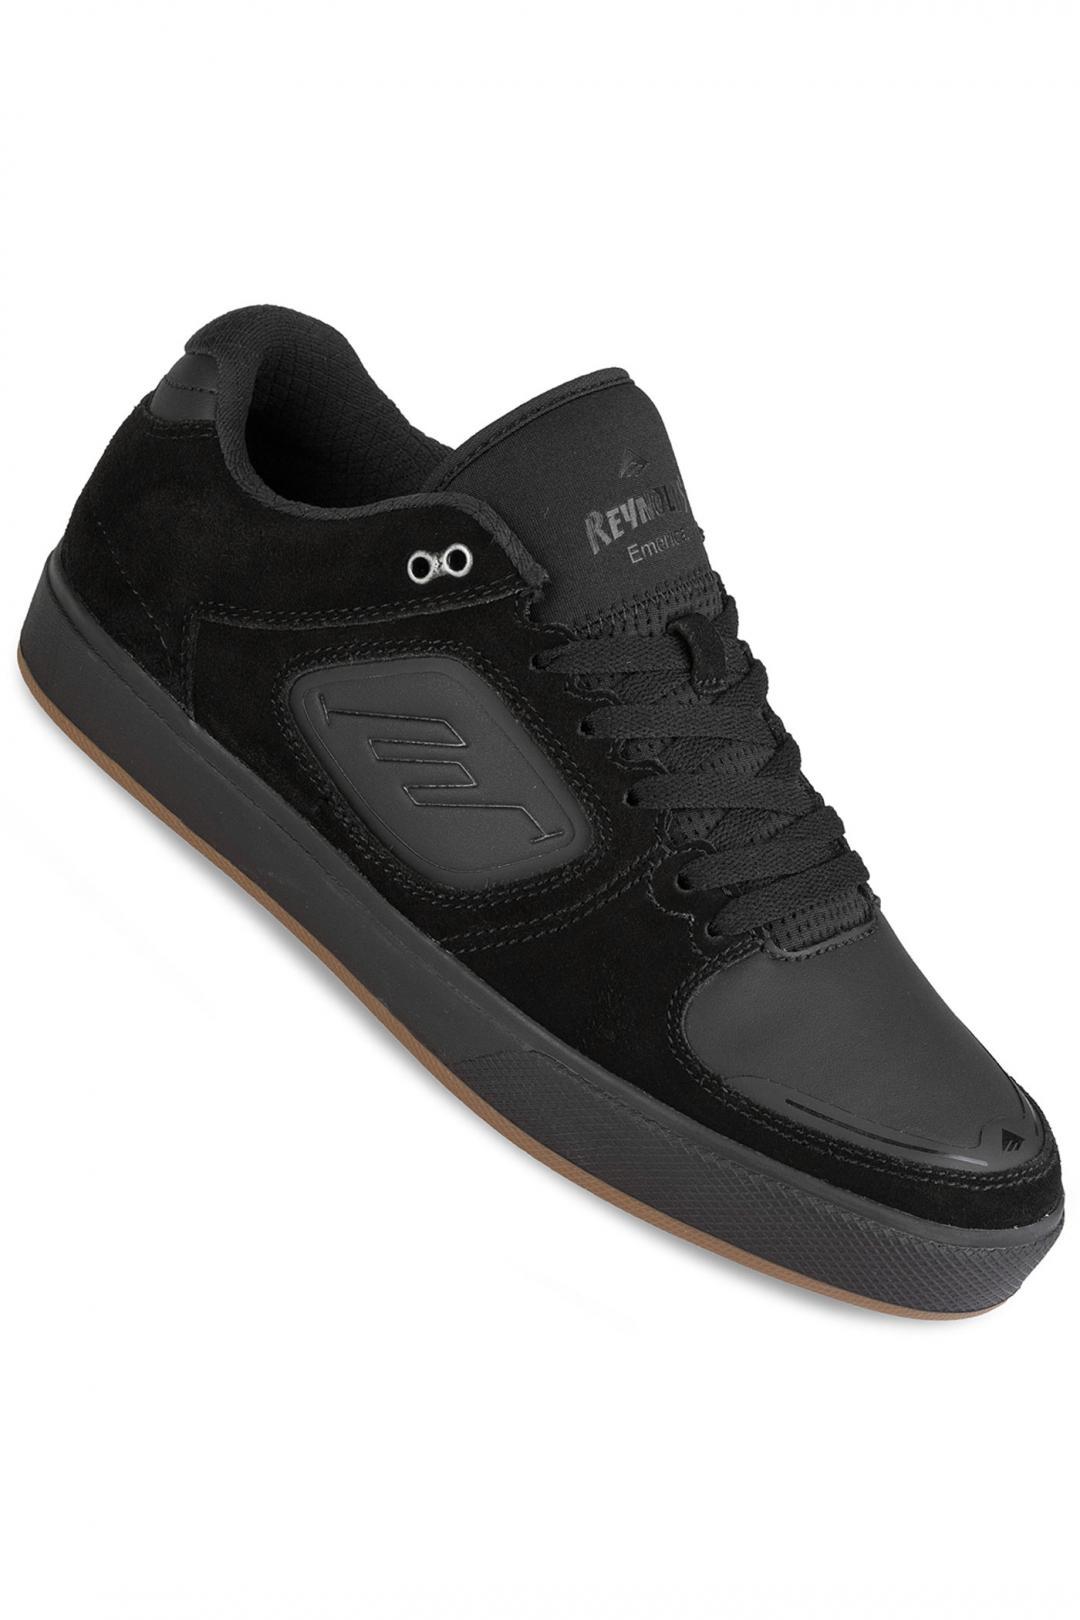 Uomo Emerica Reynolds G6 black black gum | Scarpe da skate